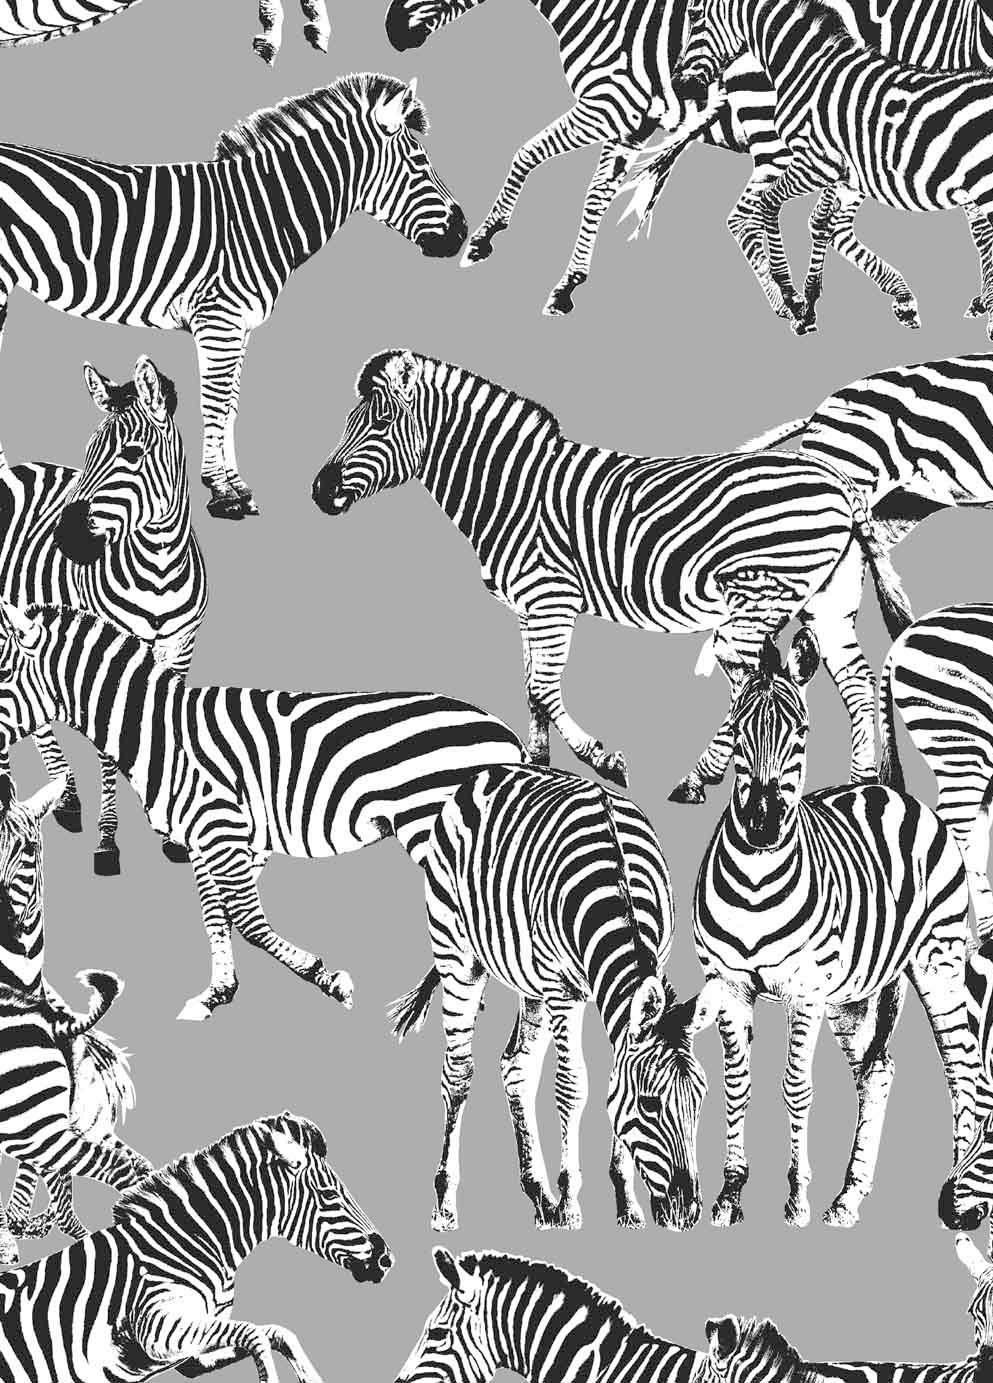 Vilber Zebras Mid Grey Wallpaper Main Image Zebra Wallpaper Animal Print Wallpaper Zebras